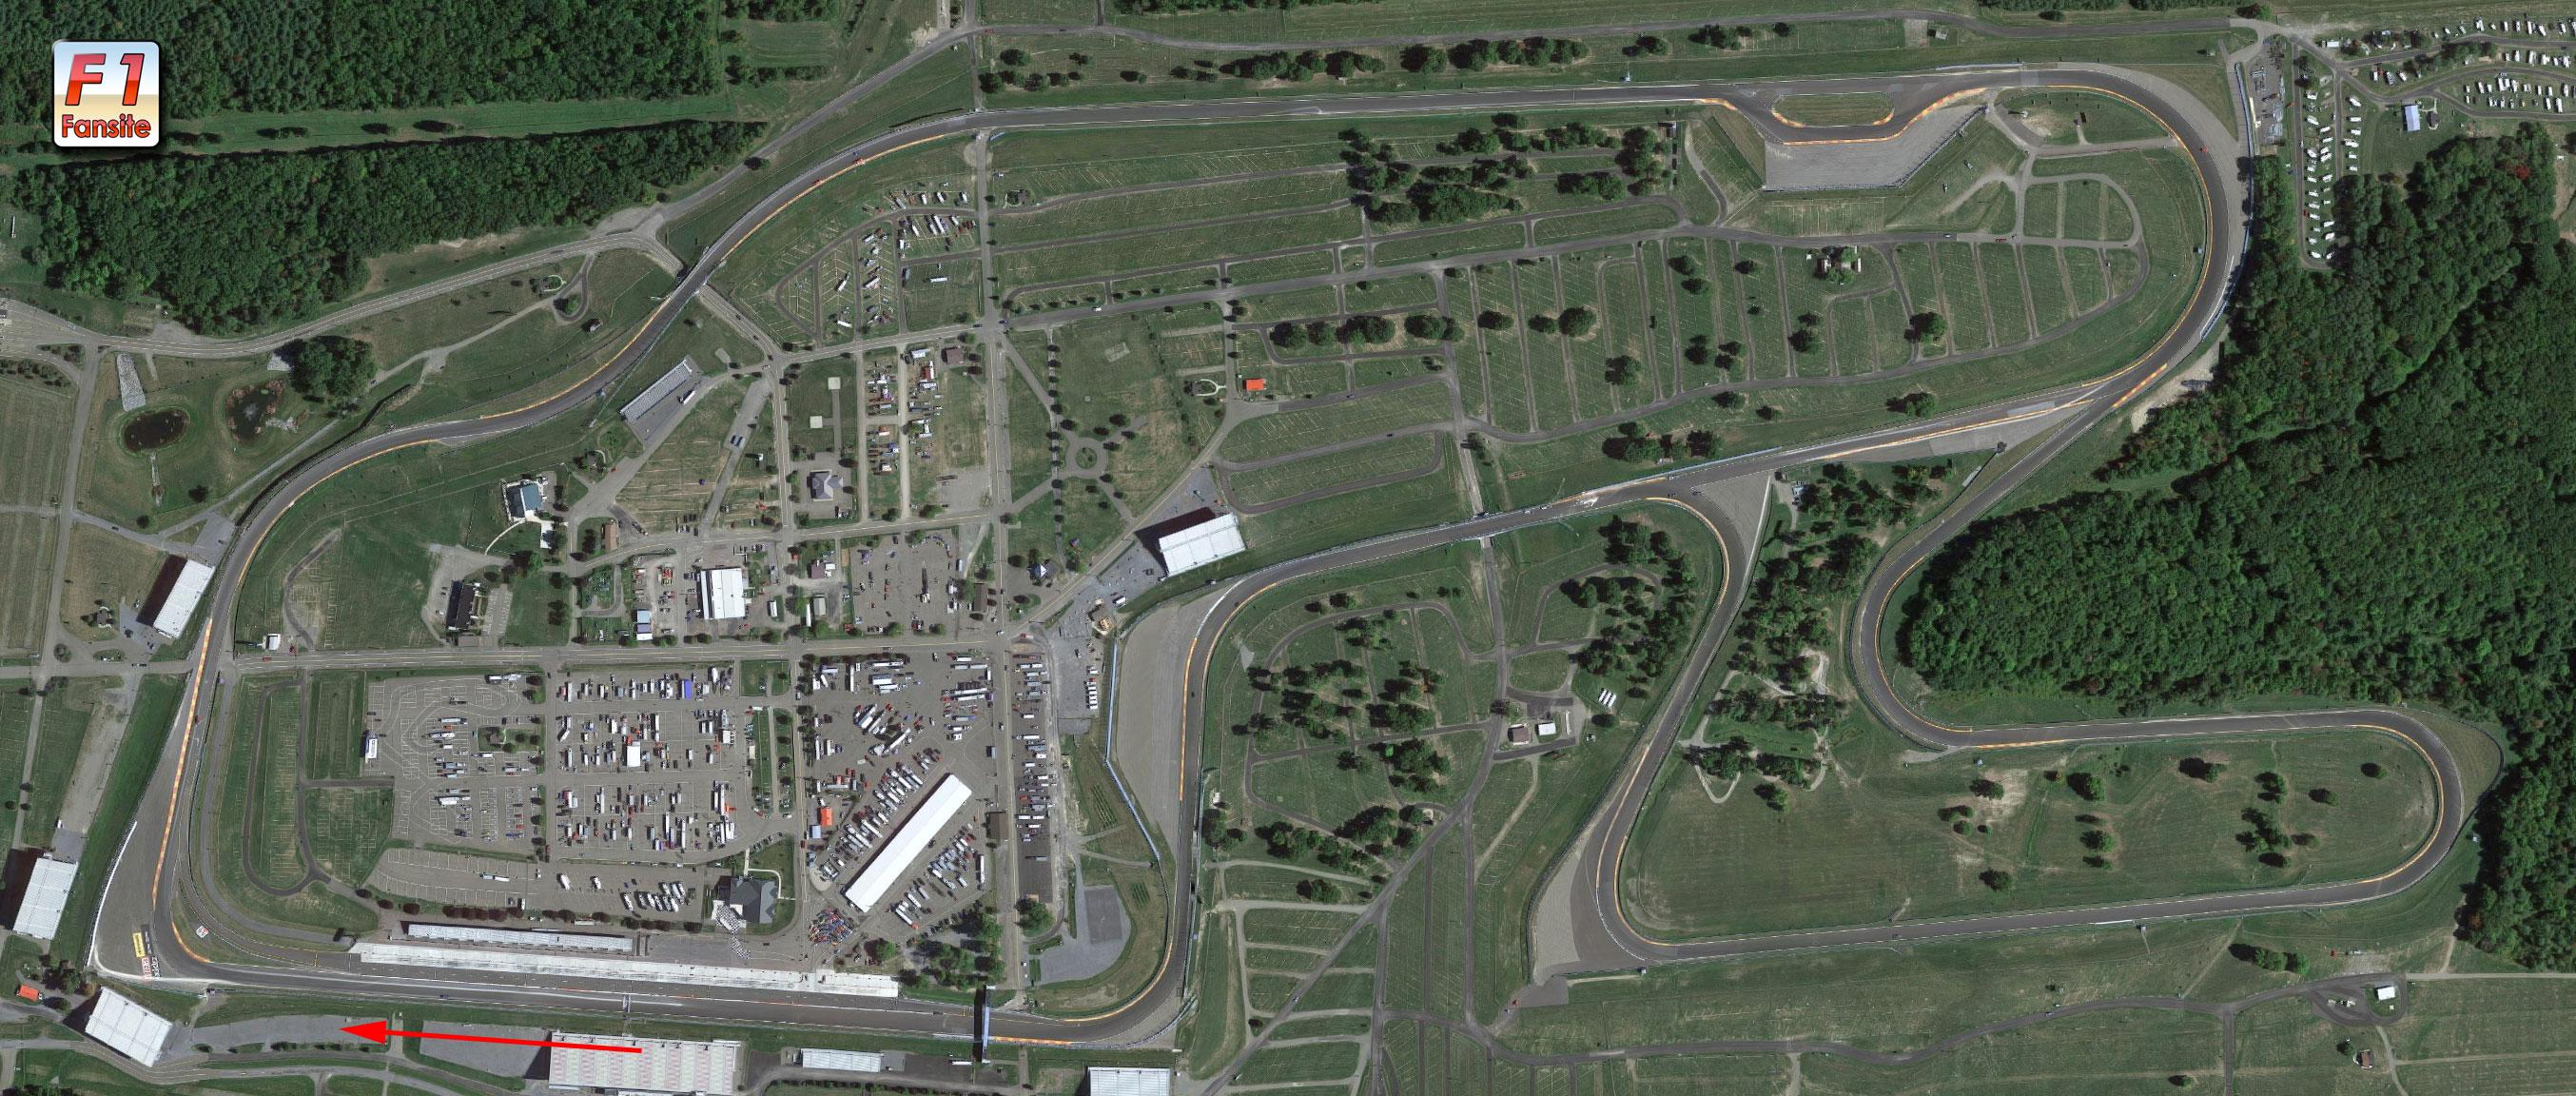 Watkins Glen circuit layout